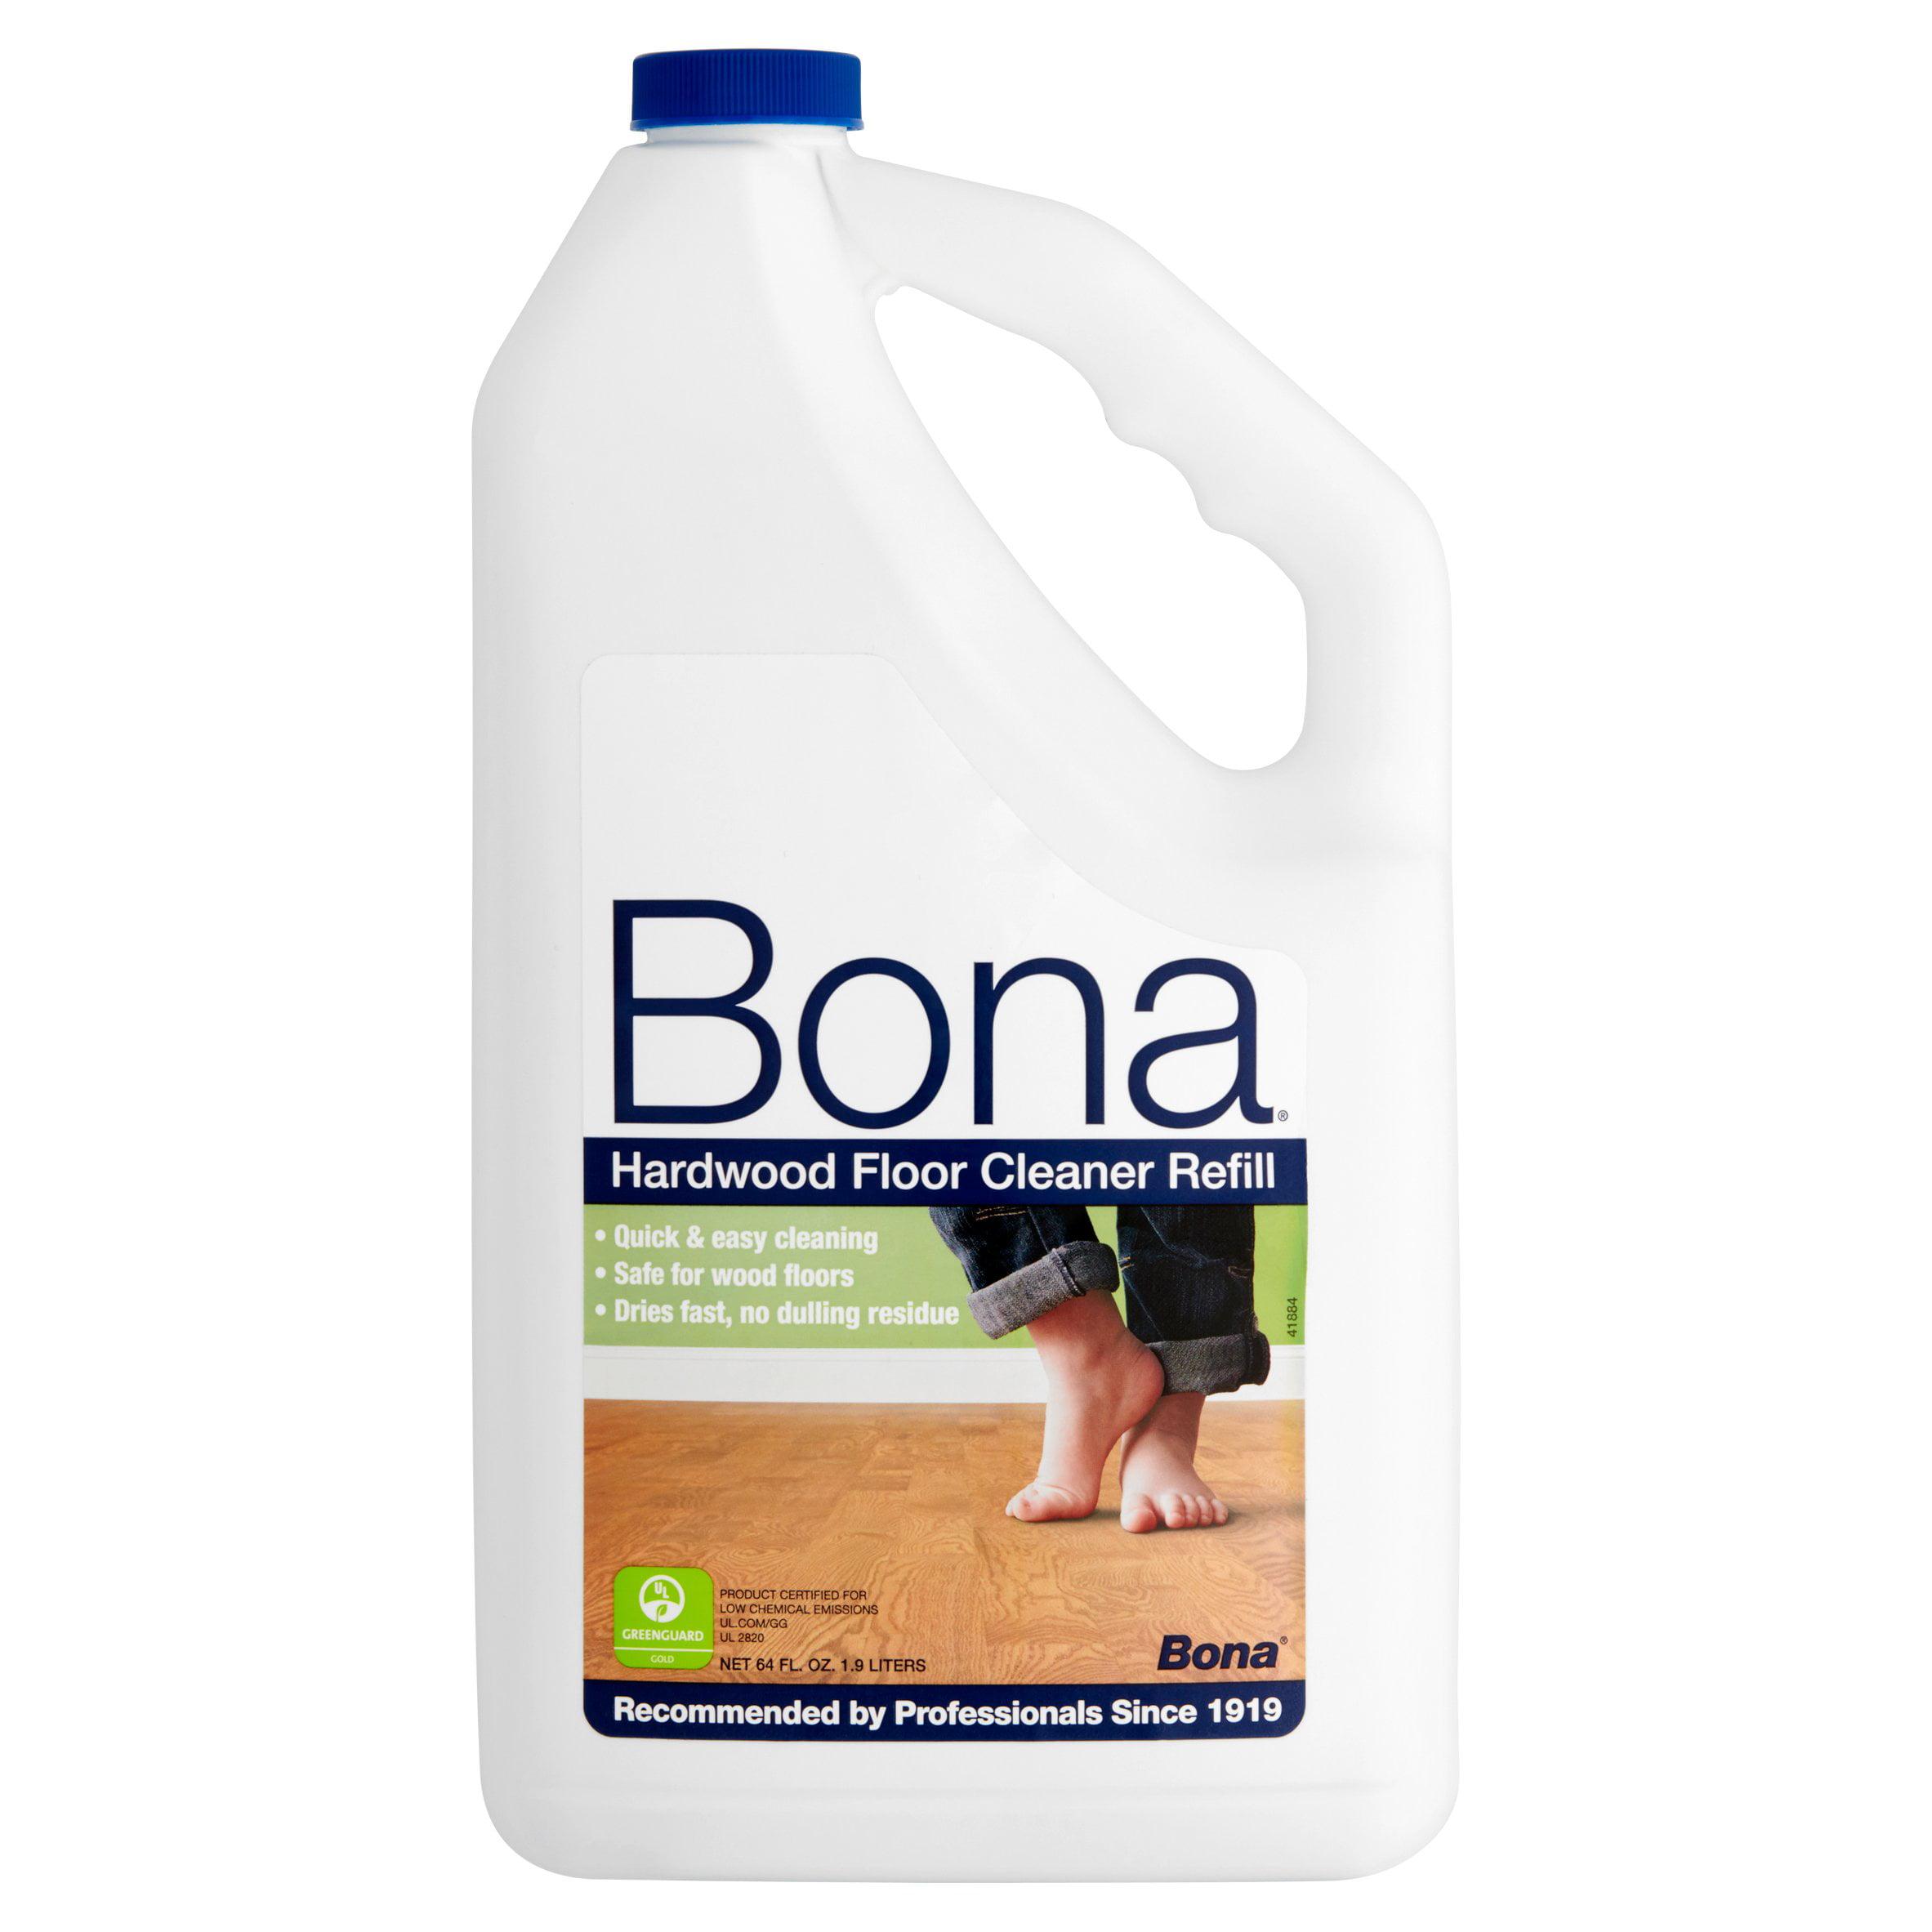 Bona Swedish Formula Hardwood Floor Cleaner, 64 oz